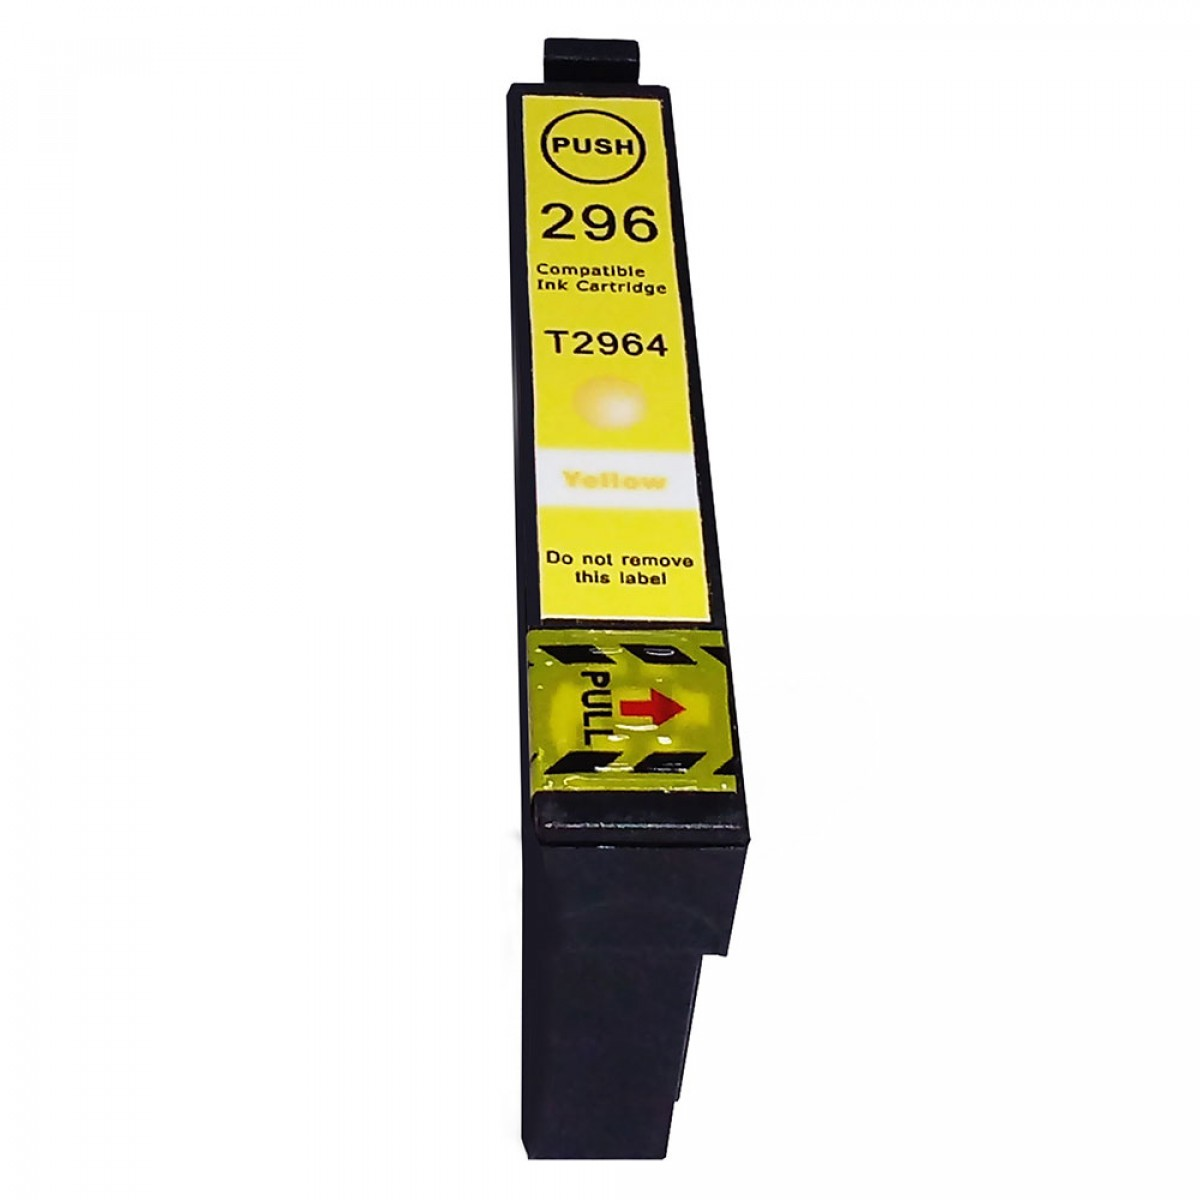 Foto 1 - EPSON TO 296/297  T296420BR  Cartucho Compatível  4ml   Cor: Yellow